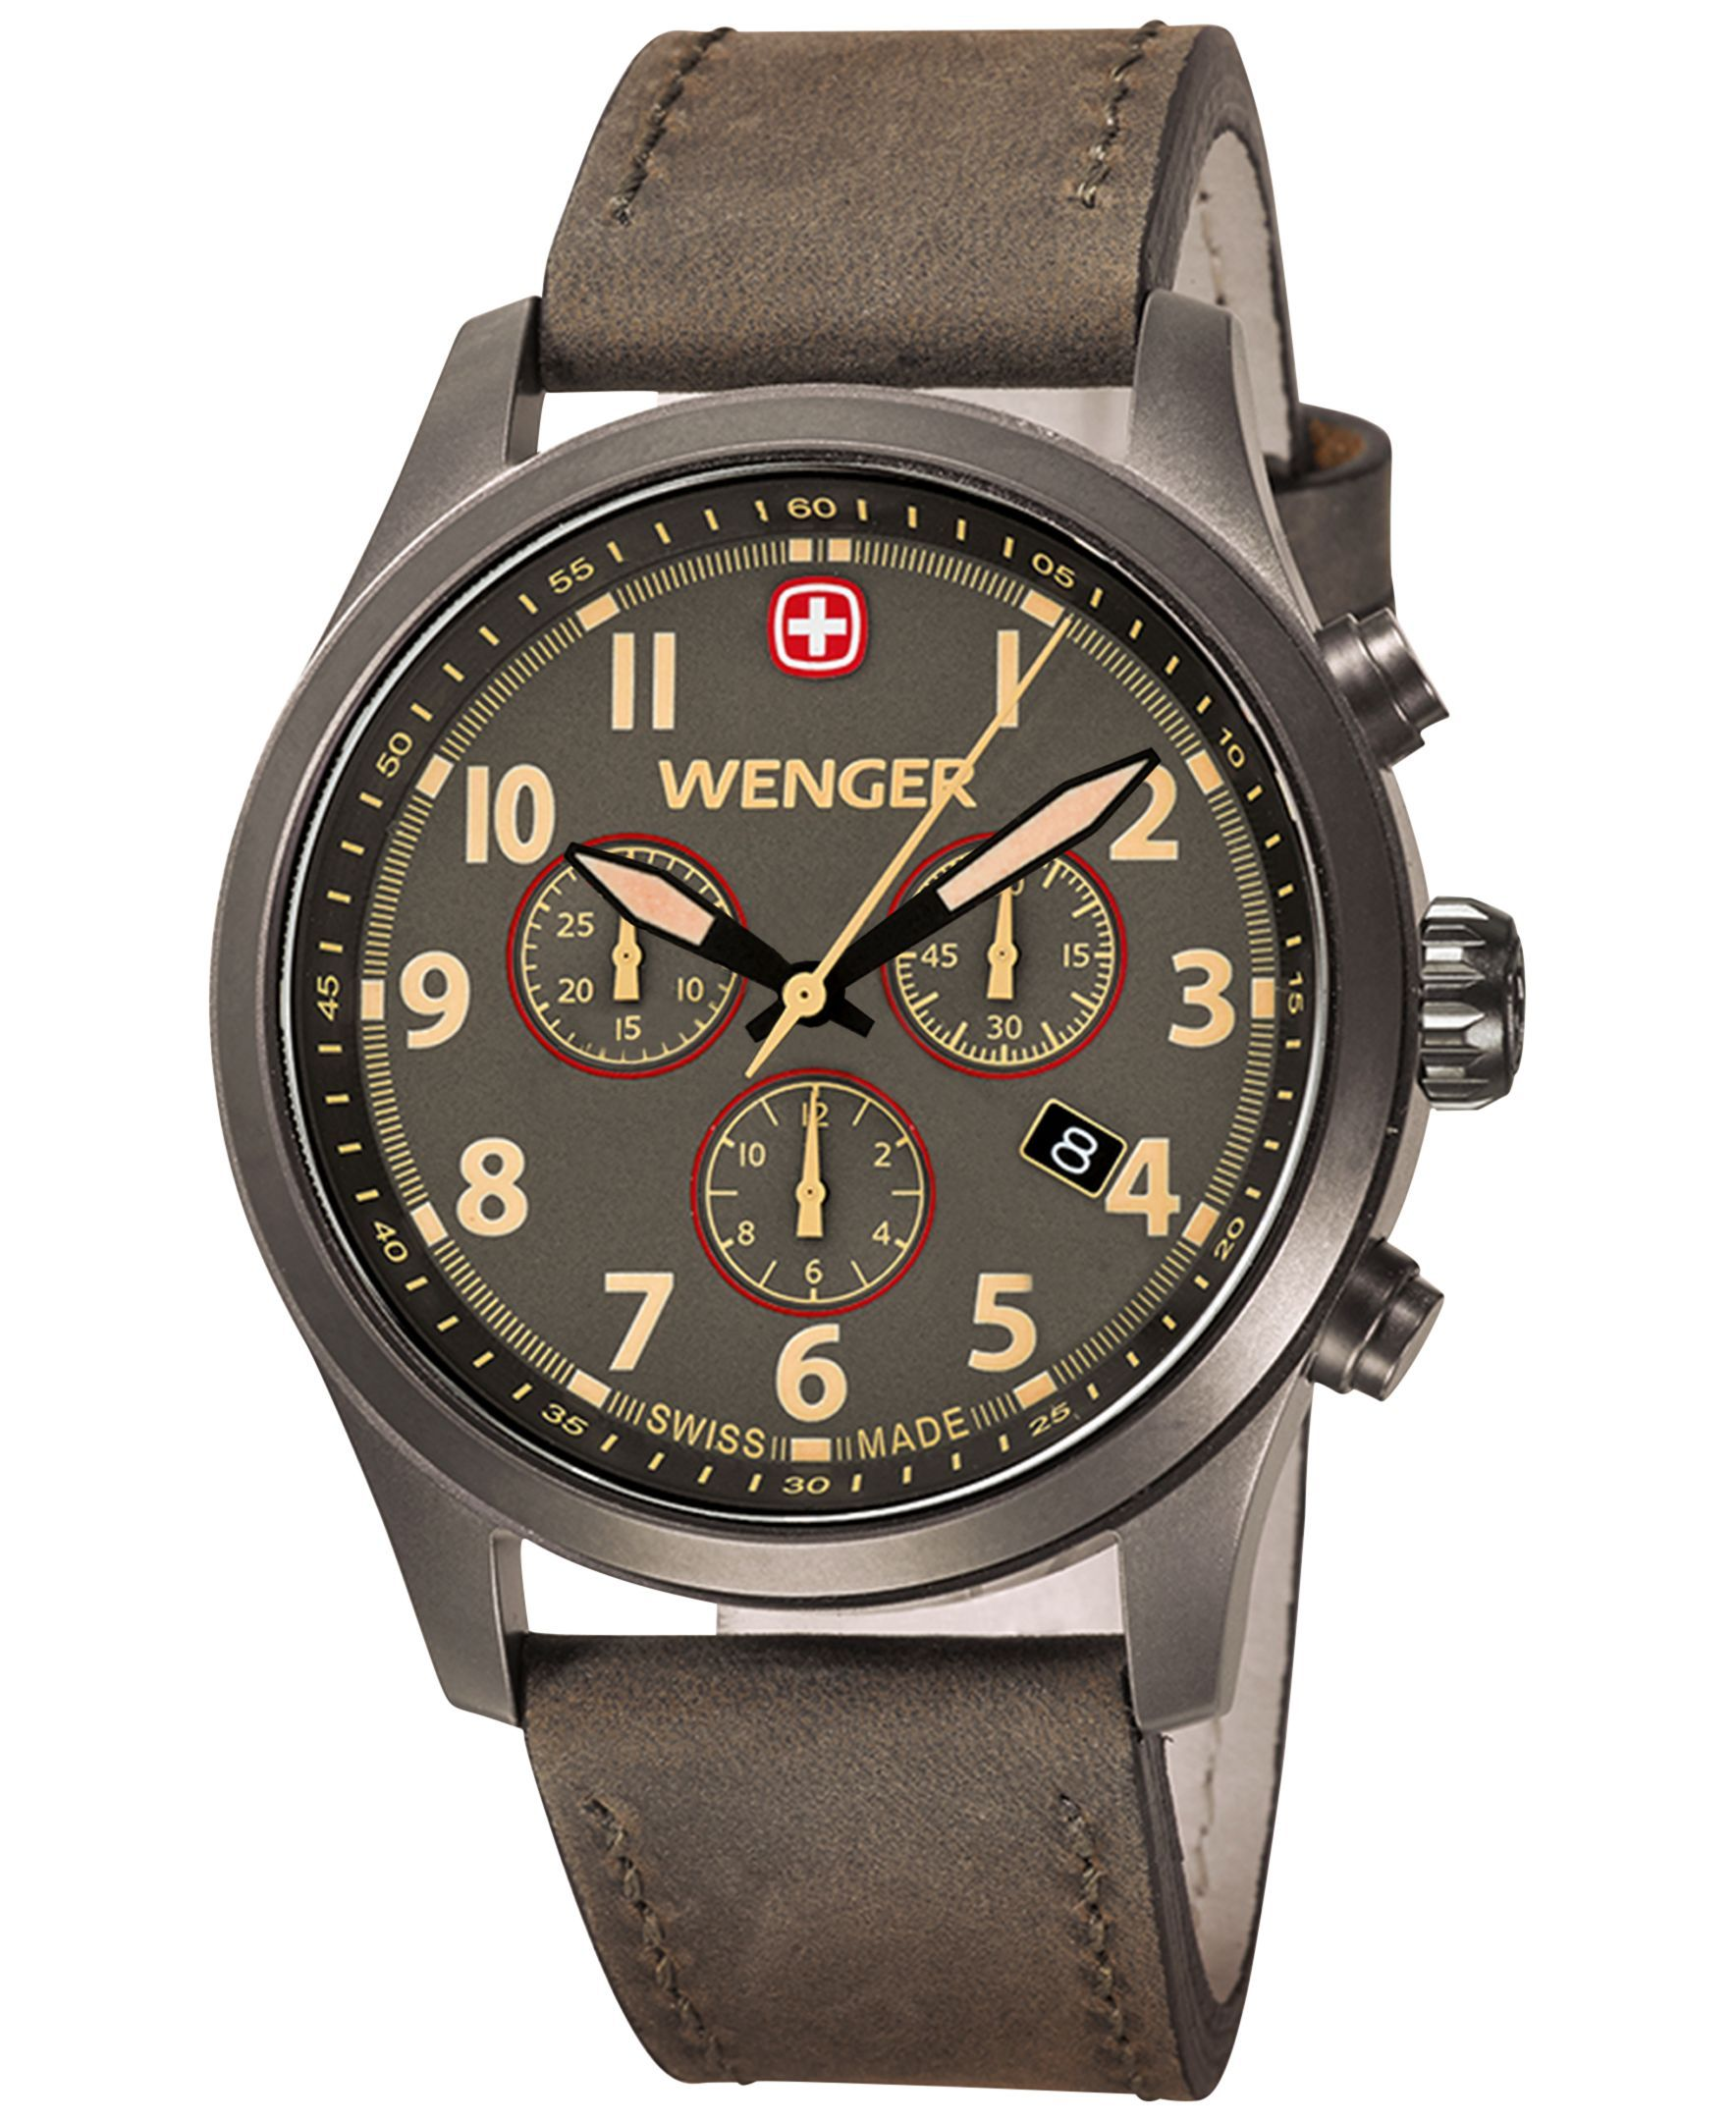 c438d1dfa09 Wenger Men s Swiss Chronograph Terragraph Olive Leather Strap Watch 43mm  0543.103